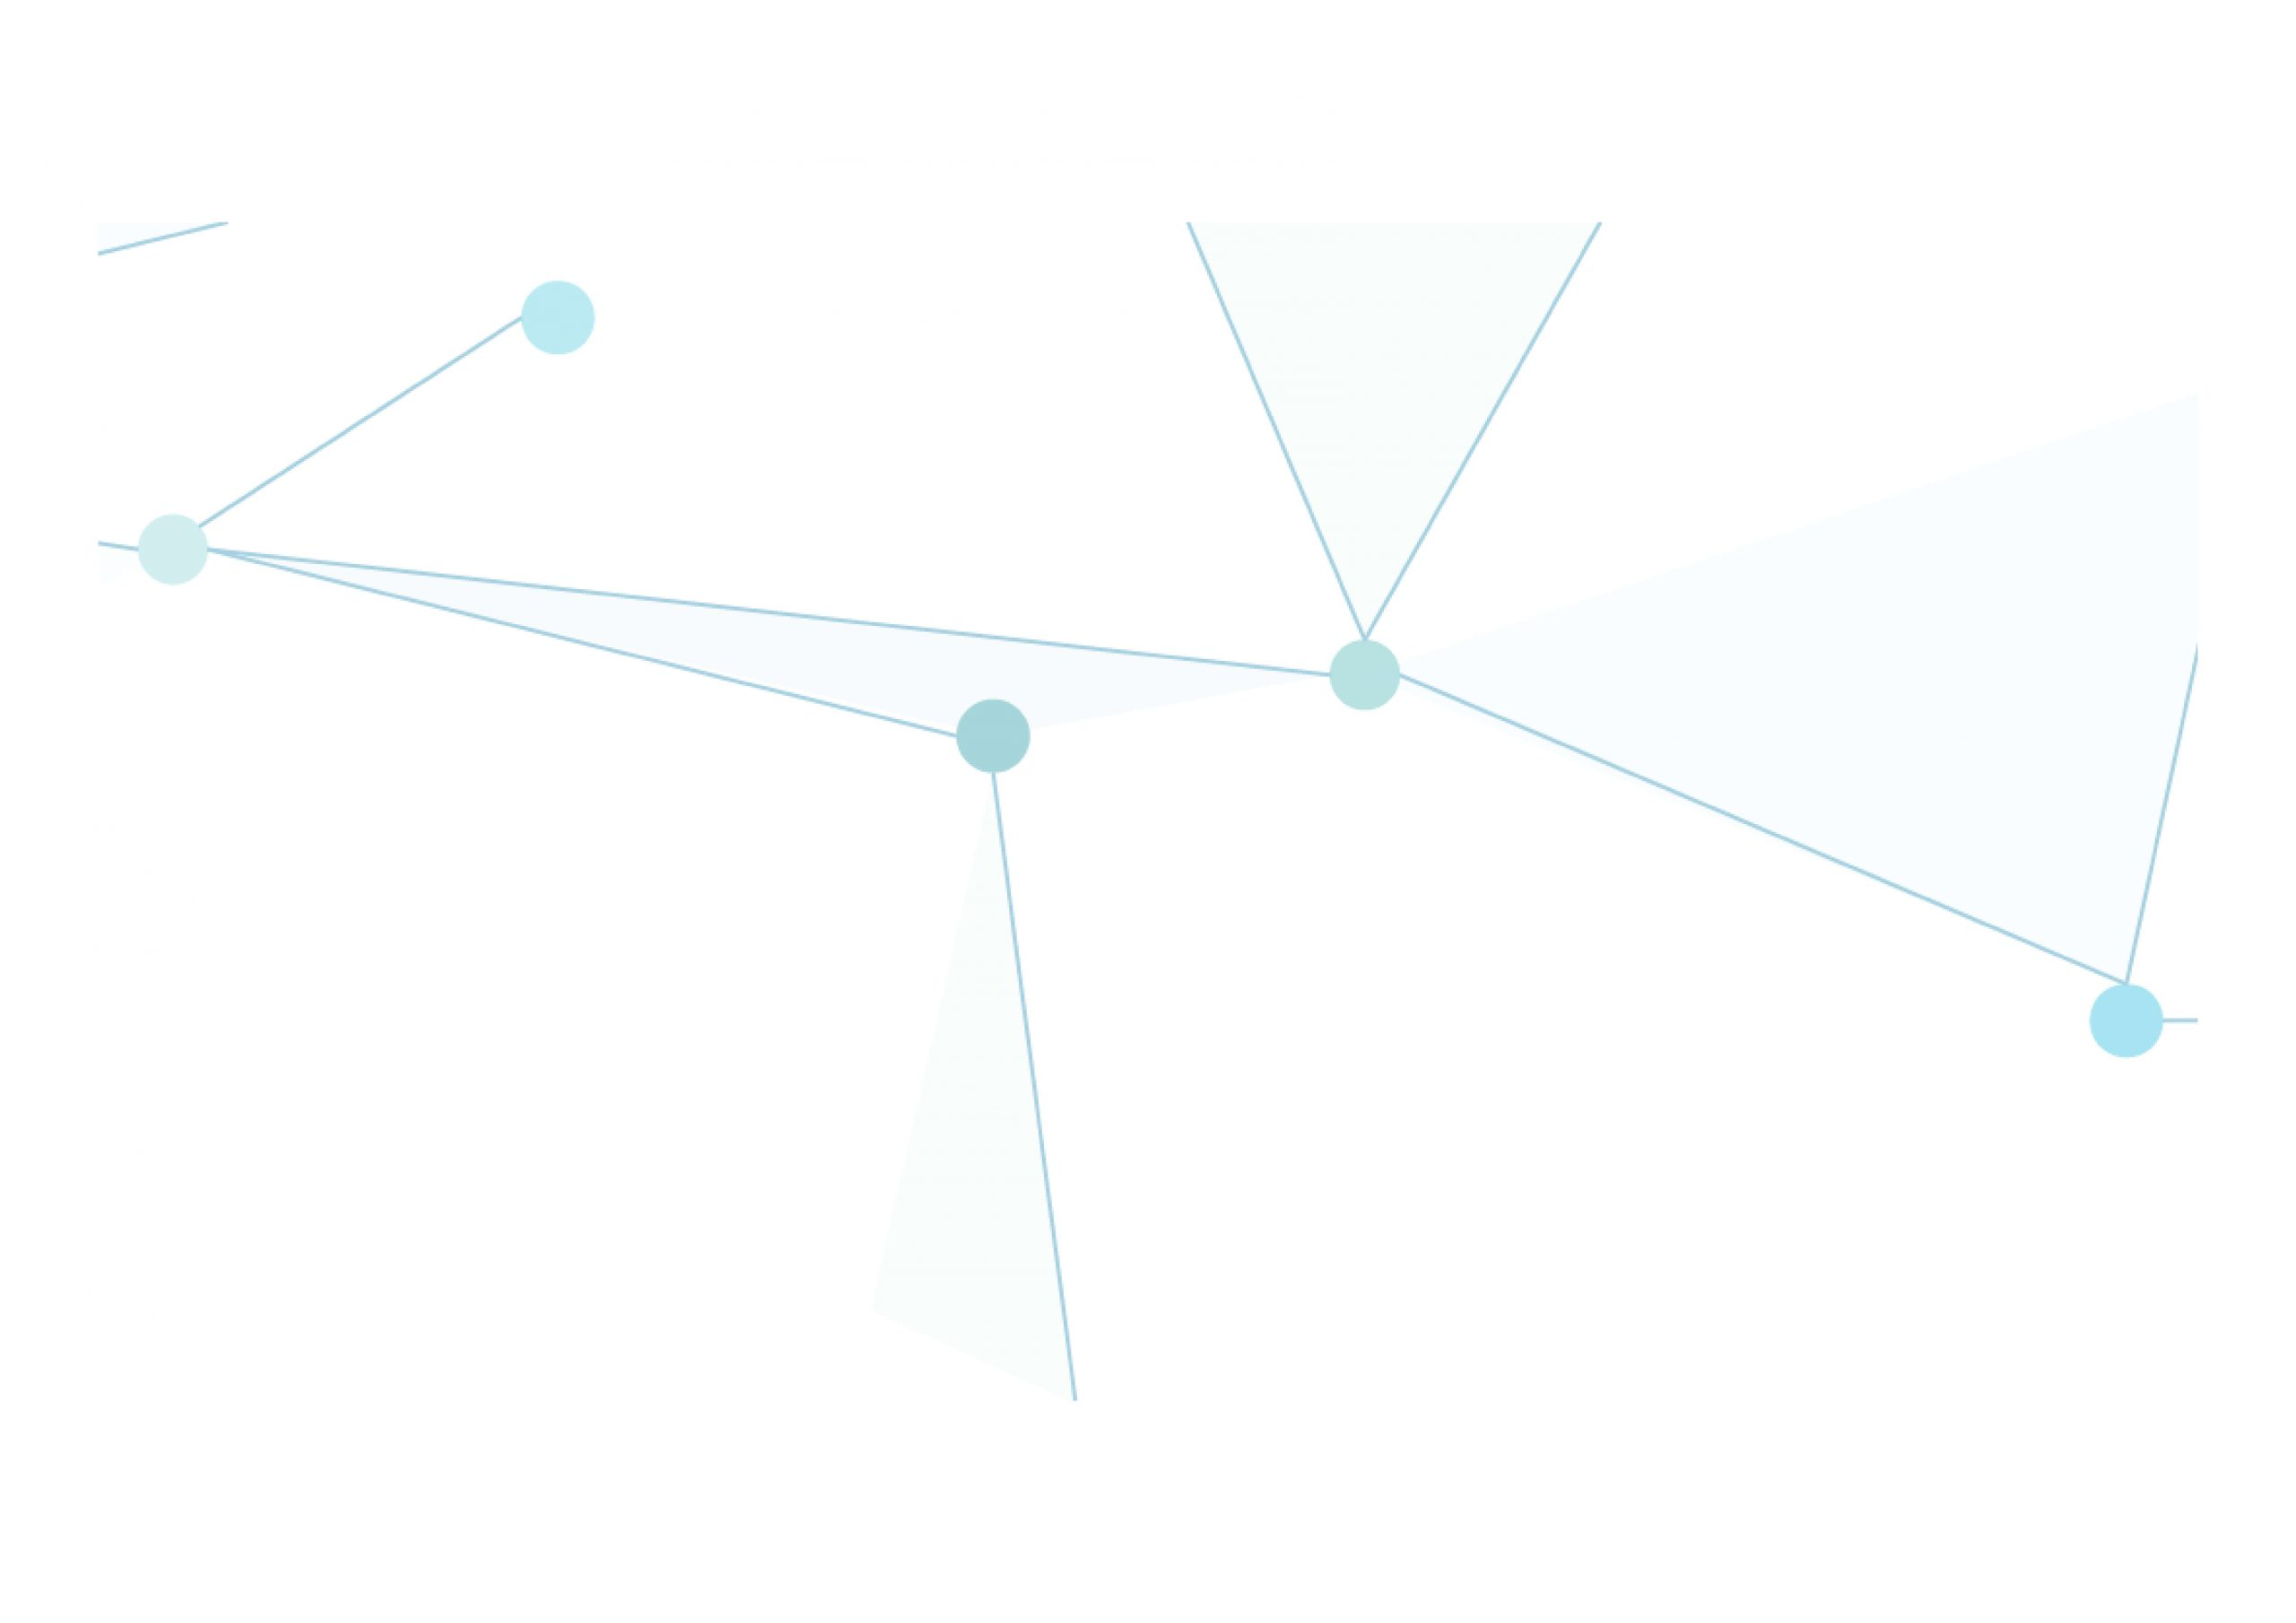 Learning Resources Hub | Adaptive Health Intelligence